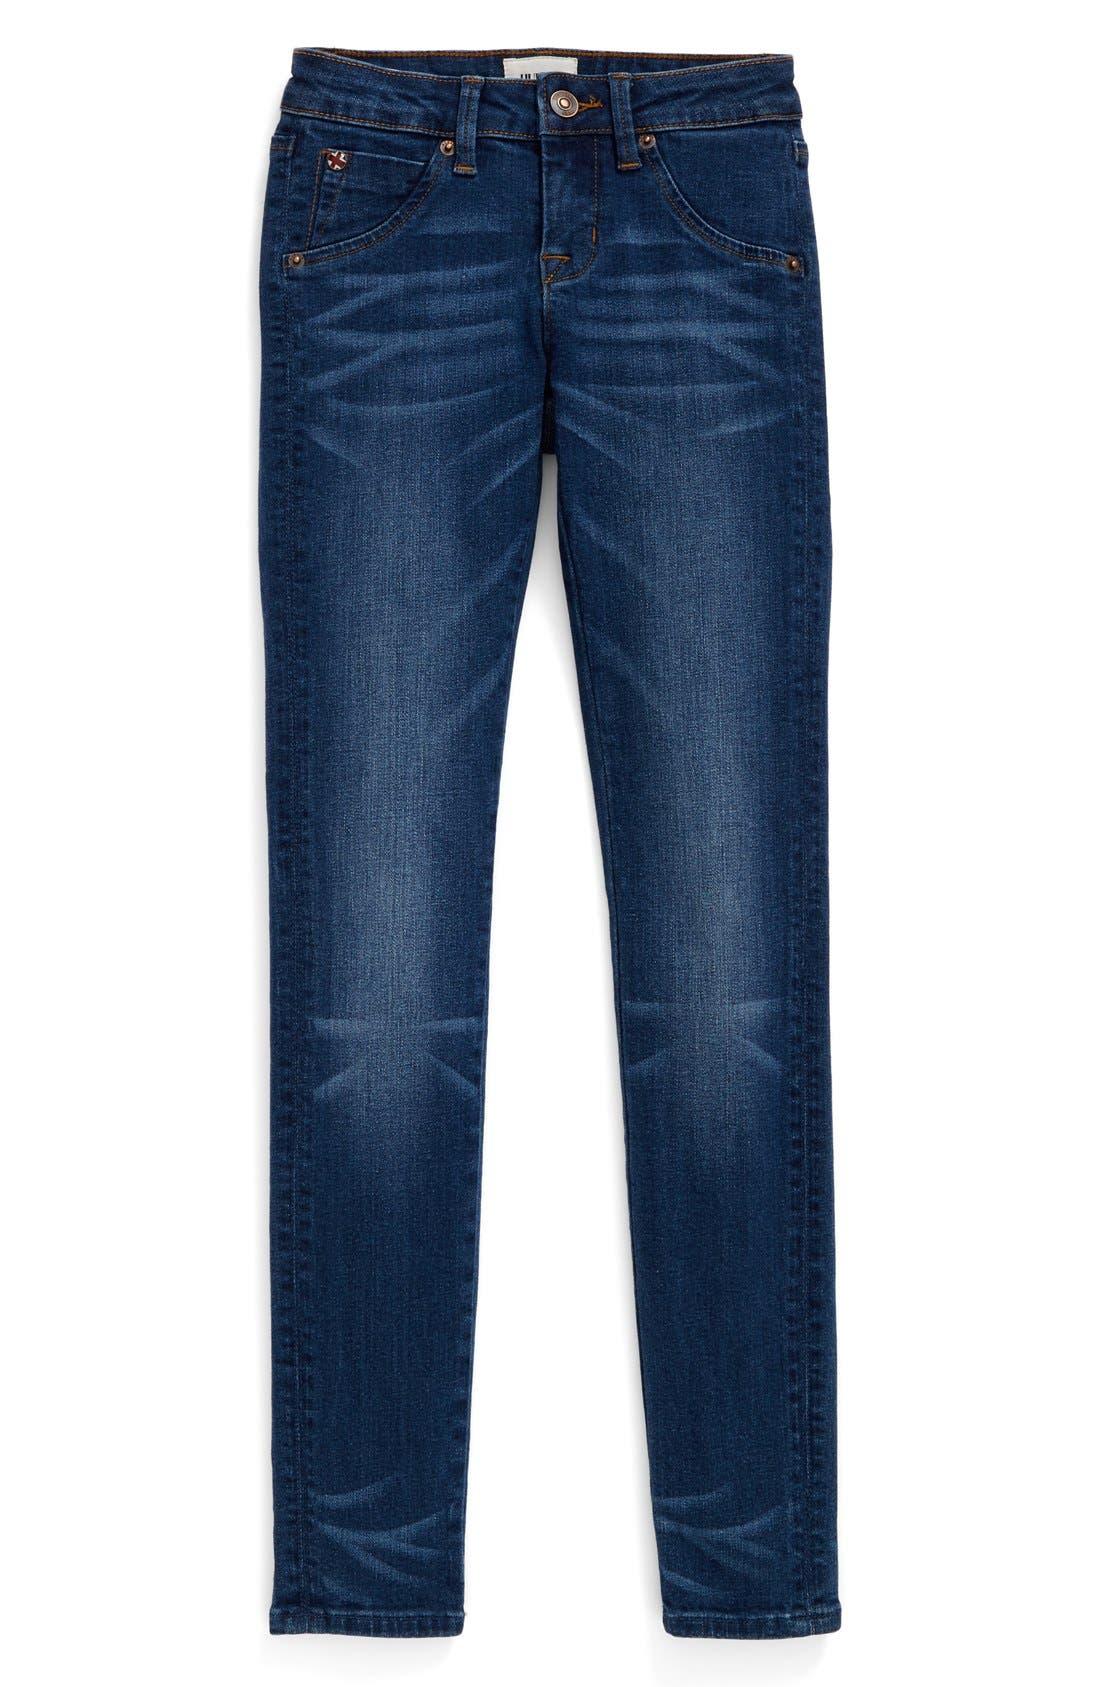 HUDSON KIDS, 'Collin' Skinny Jeans, Main thumbnail 1, color, 484